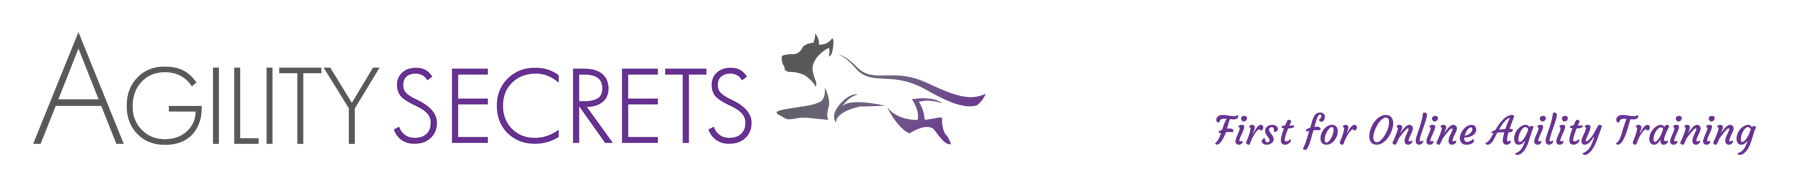 https://www.agility-secrets.com/wp-content/uploads/2018/01/agility-secrets-logo-header.jpg